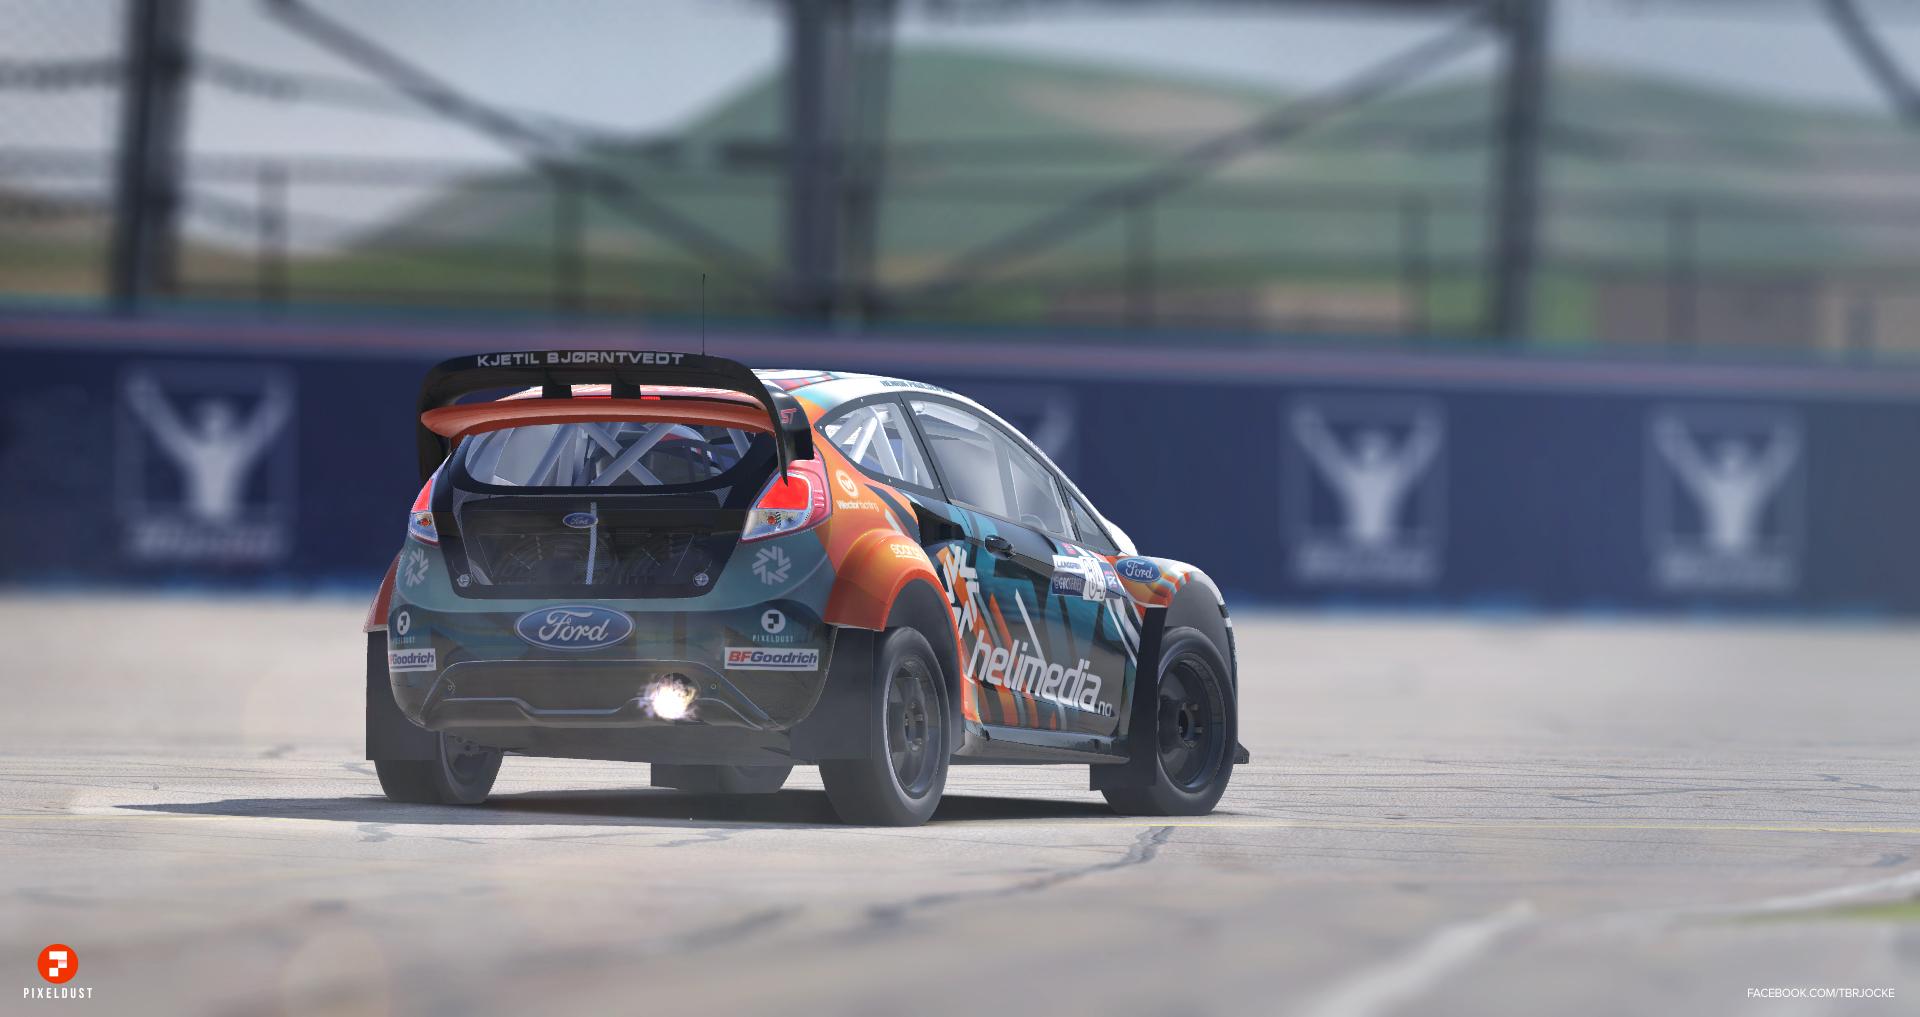 FORD FIESTA WRC HELIMEDIA_bild1.jpg